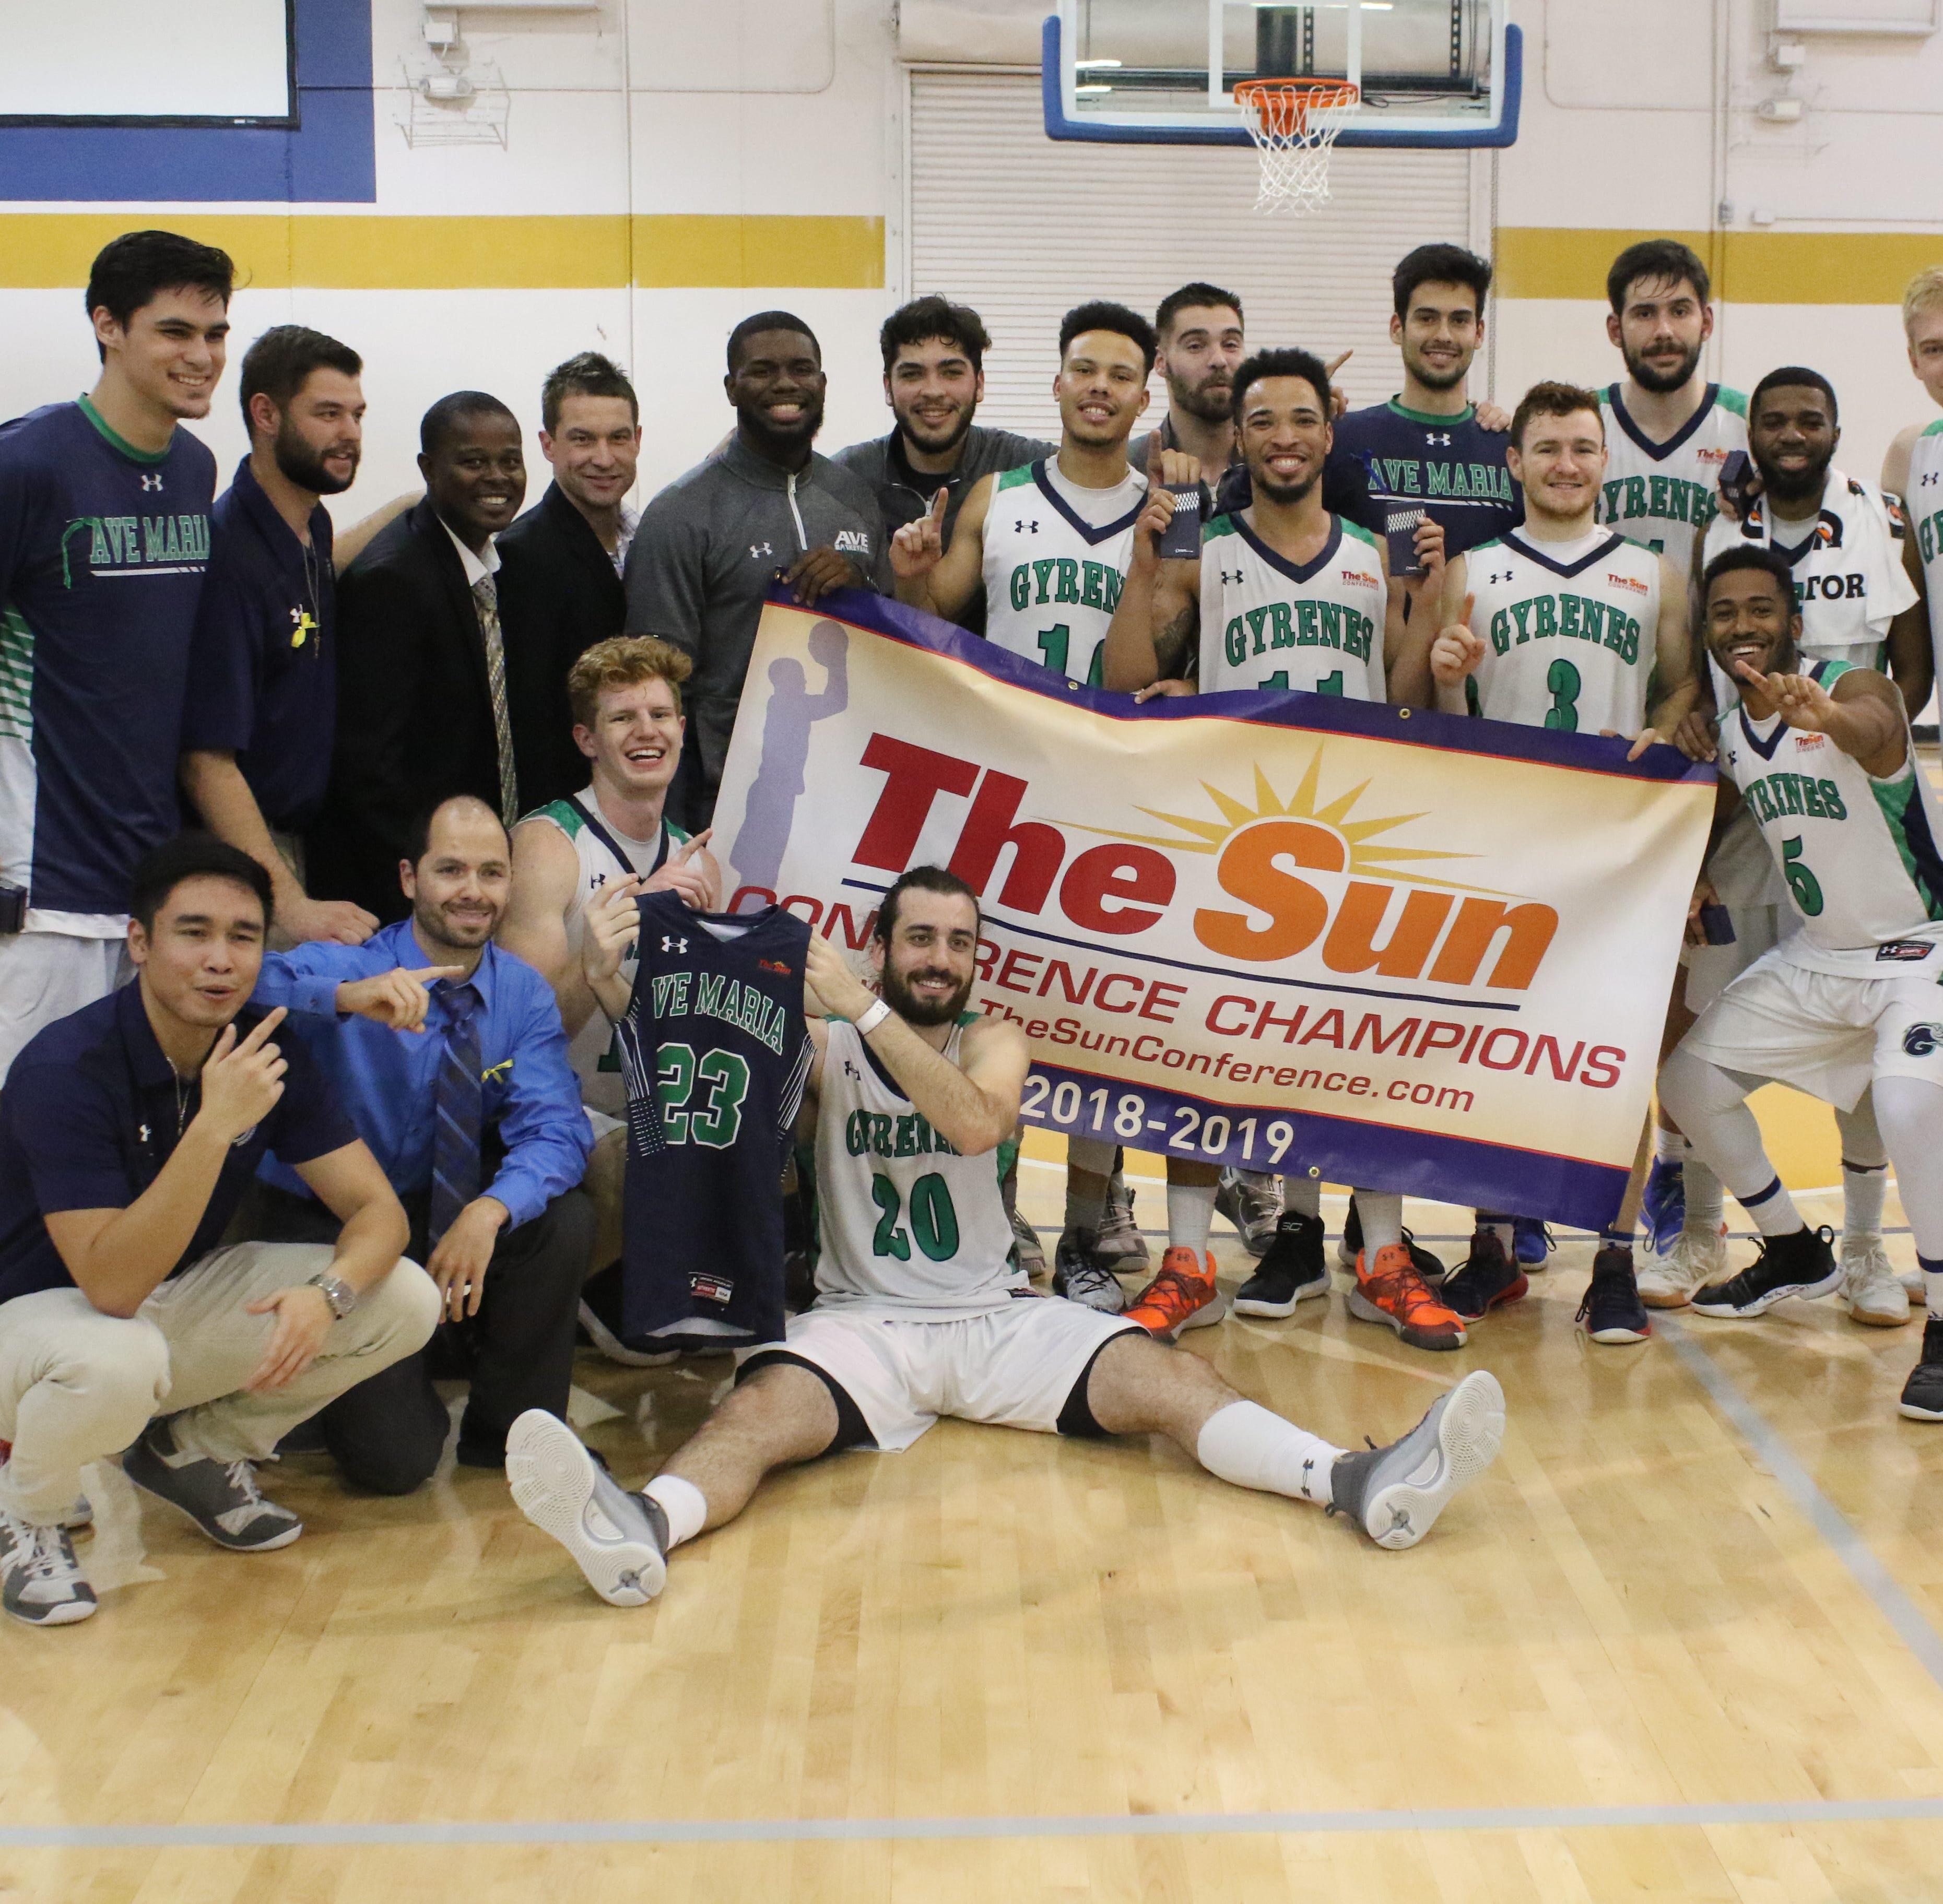 College basketball: Ave Maria men honor late Emily Acosta through run to NAIA tourney